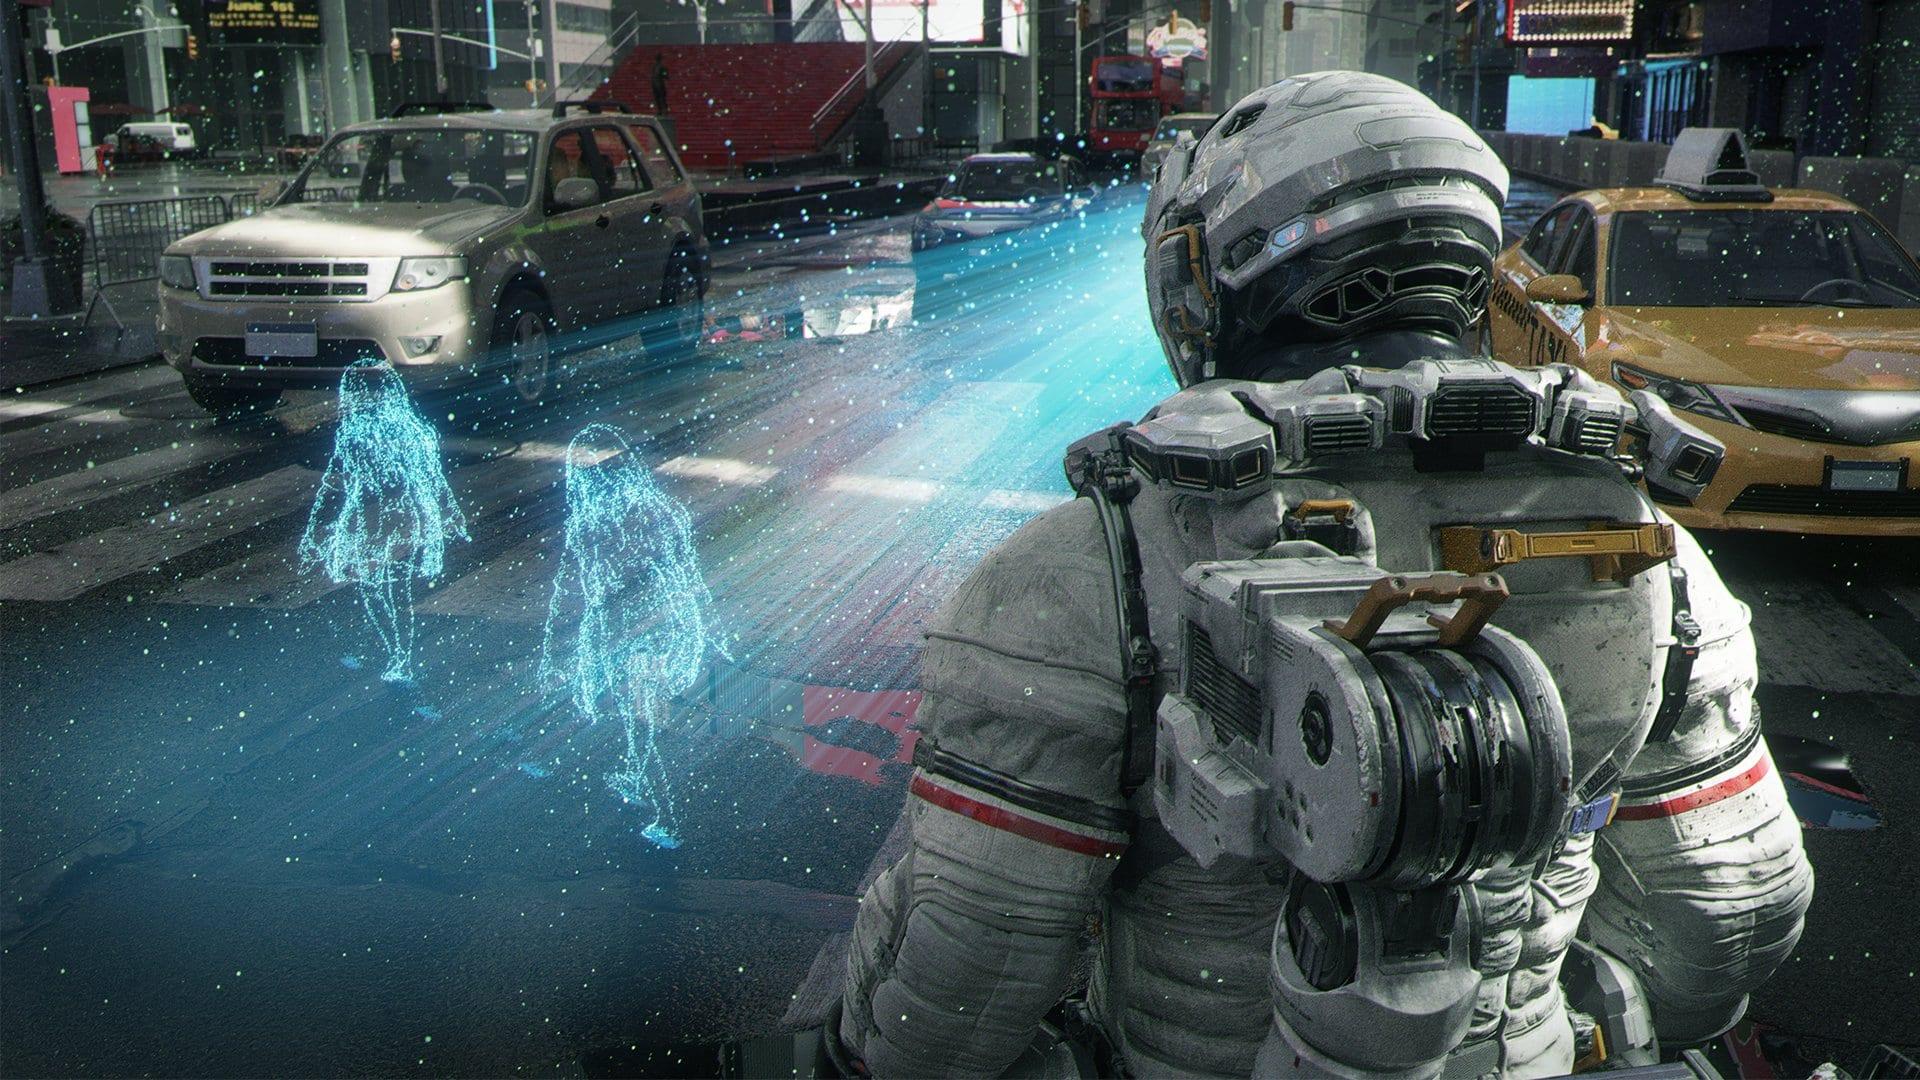 Pragmata: Release Date, Gameplay, Plot and Trailer